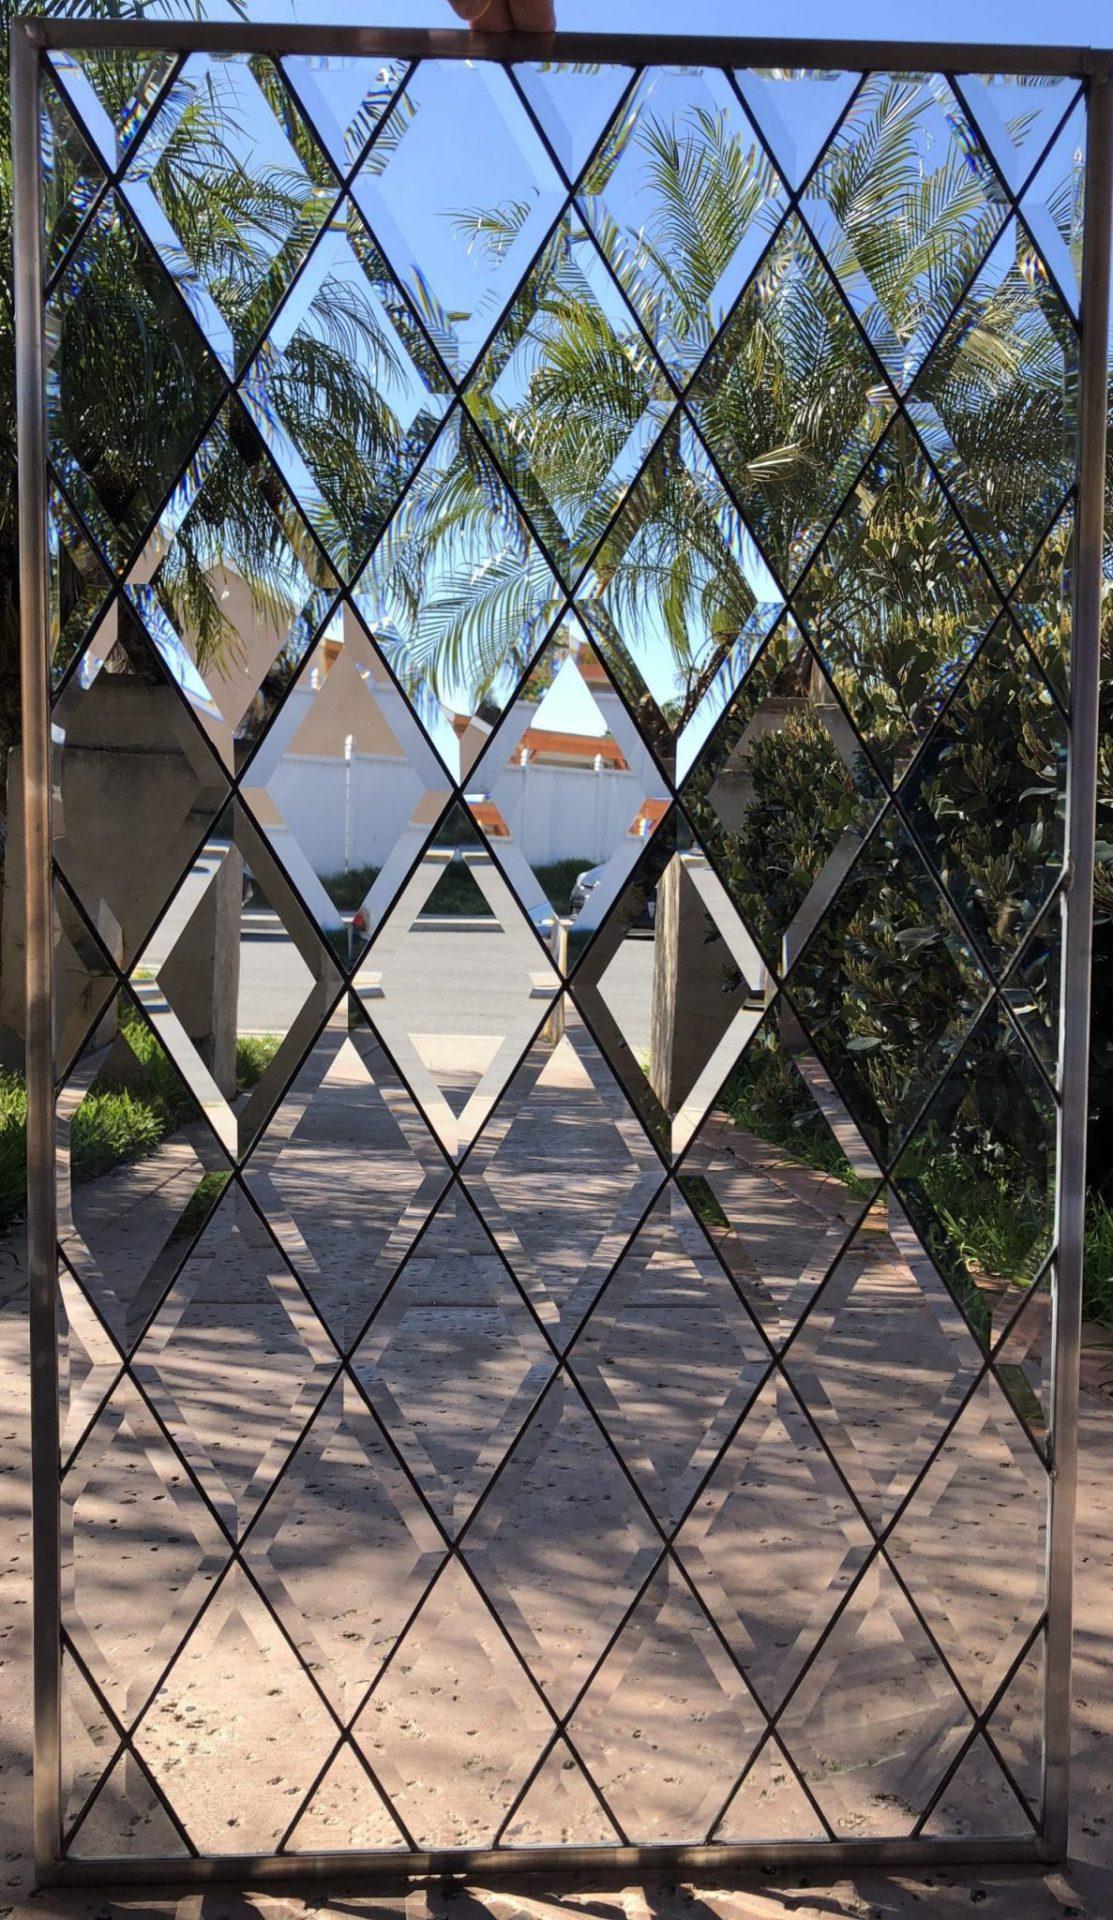 The Blitz Traditional Timeless Tudor Style Beveled Diamonds Leaded Glass Window